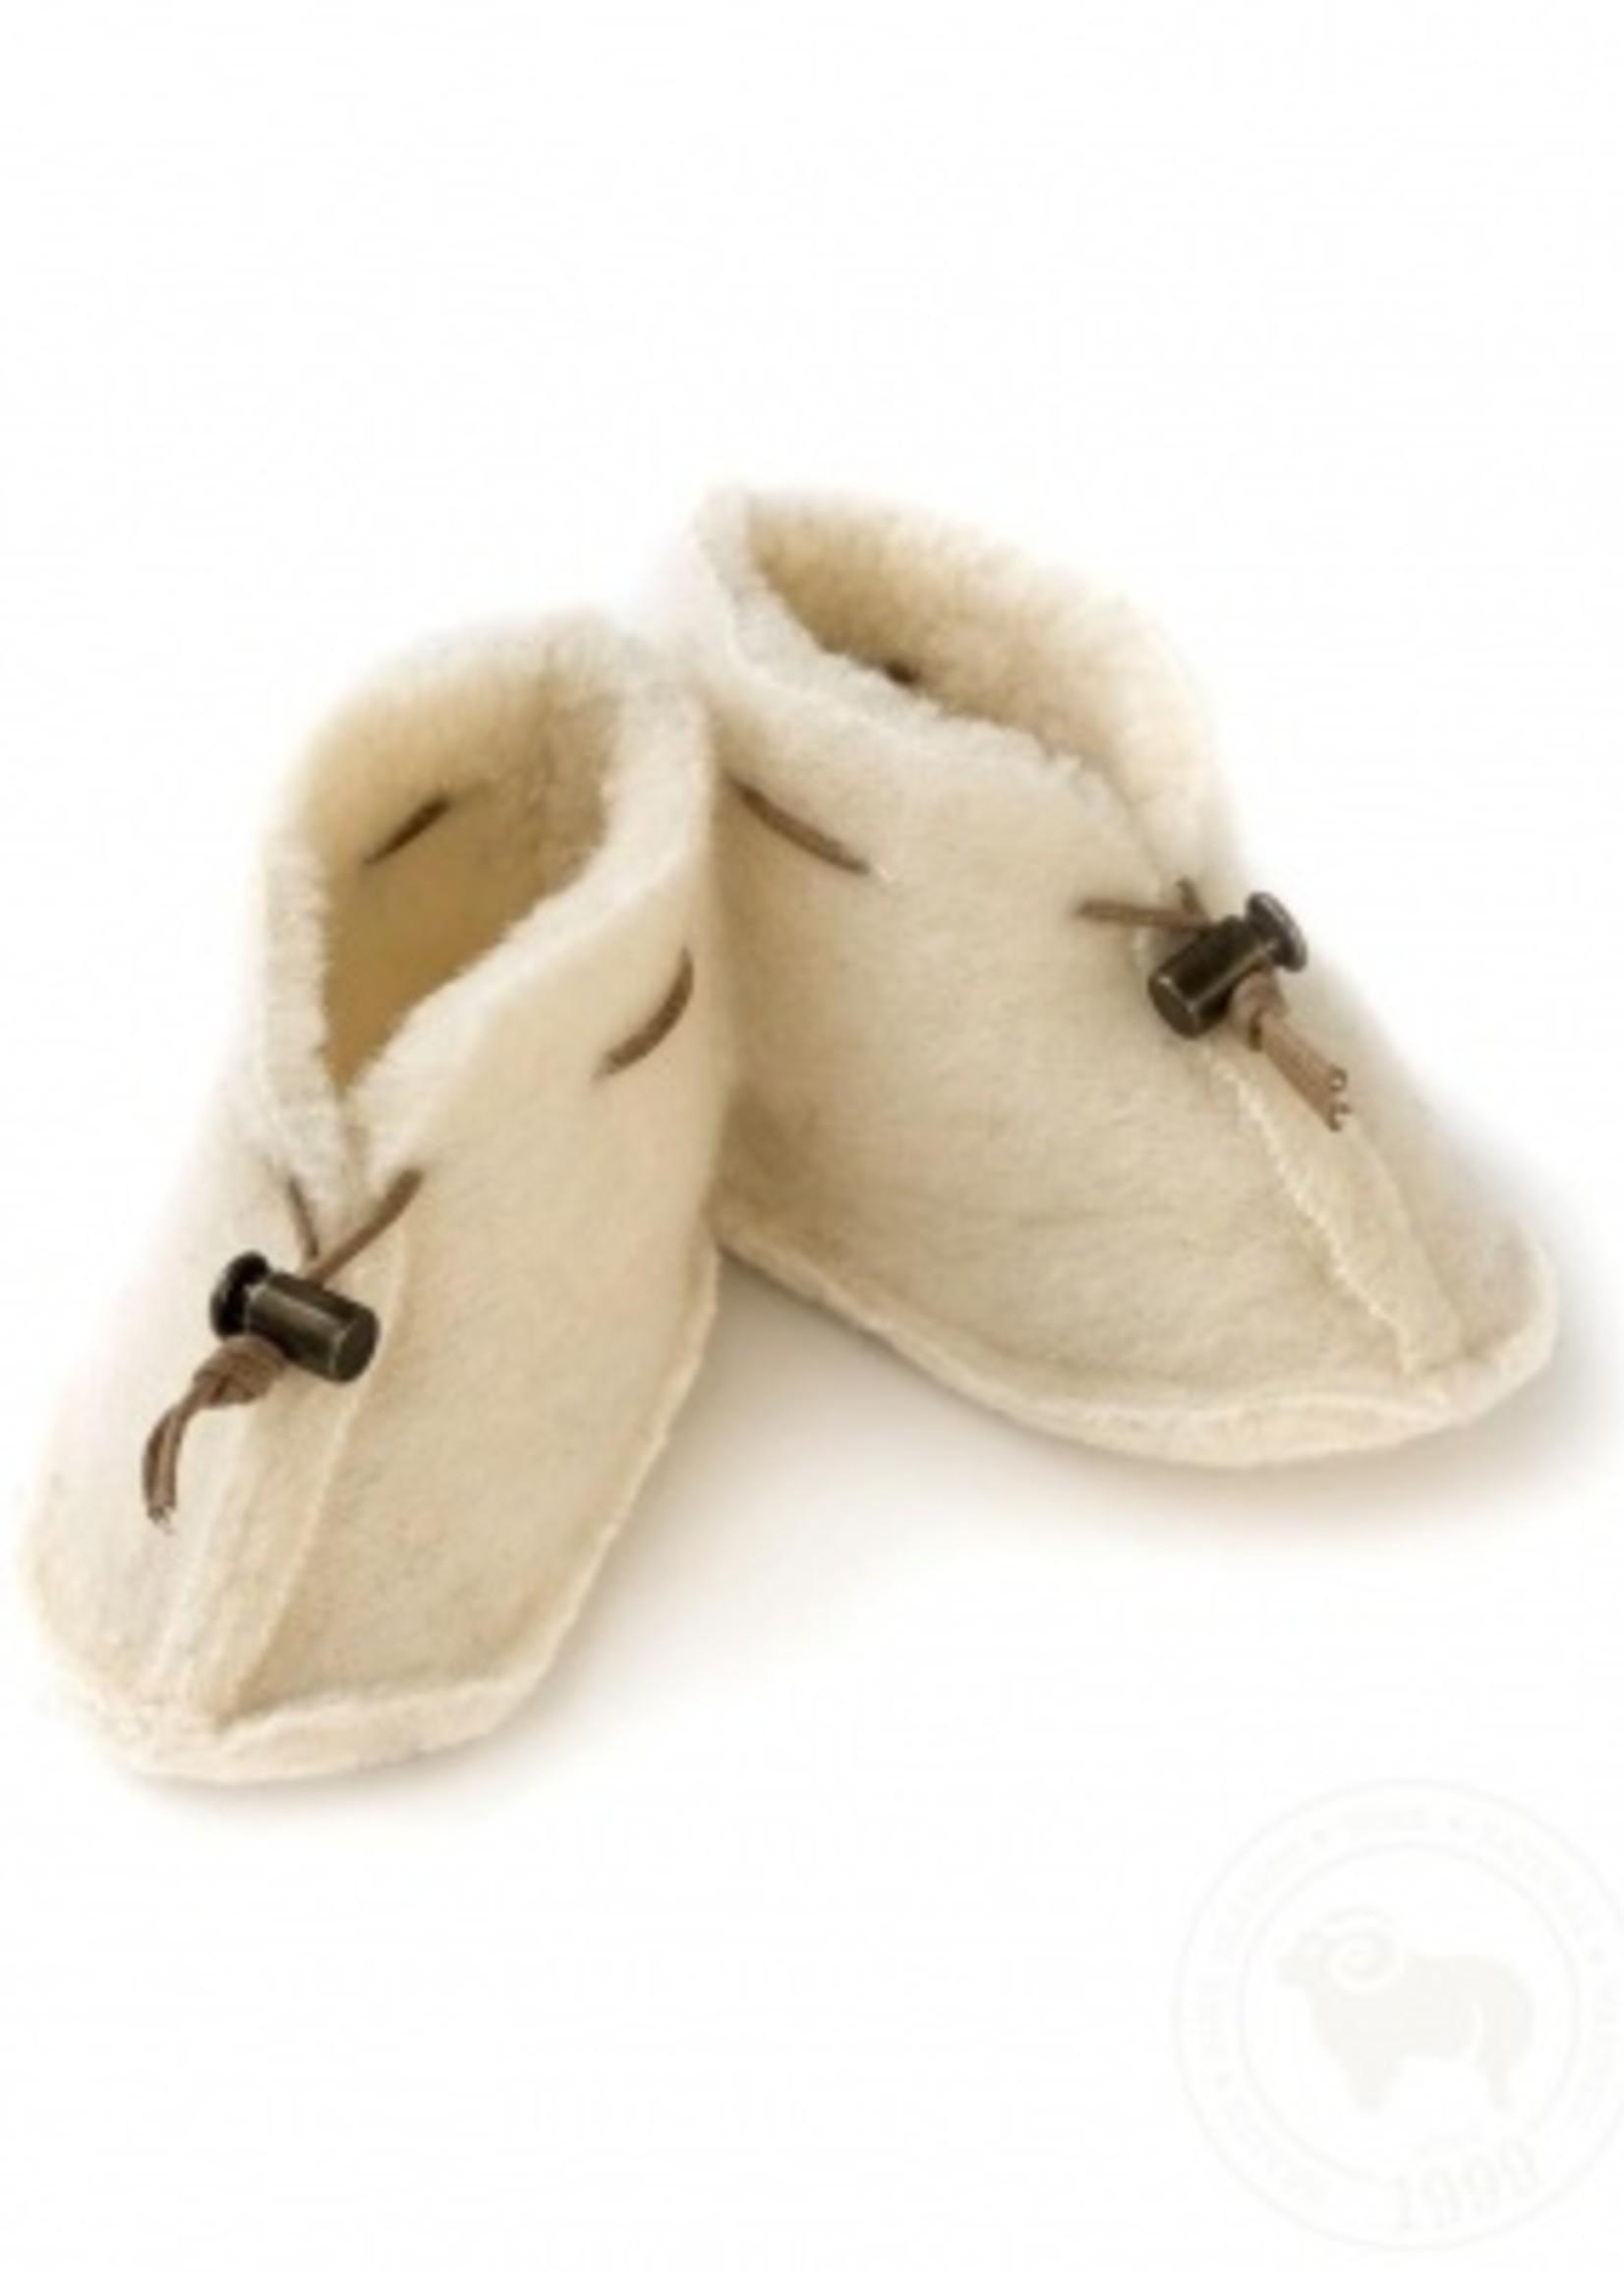 Alwero Slippers 100% emowool - Natural